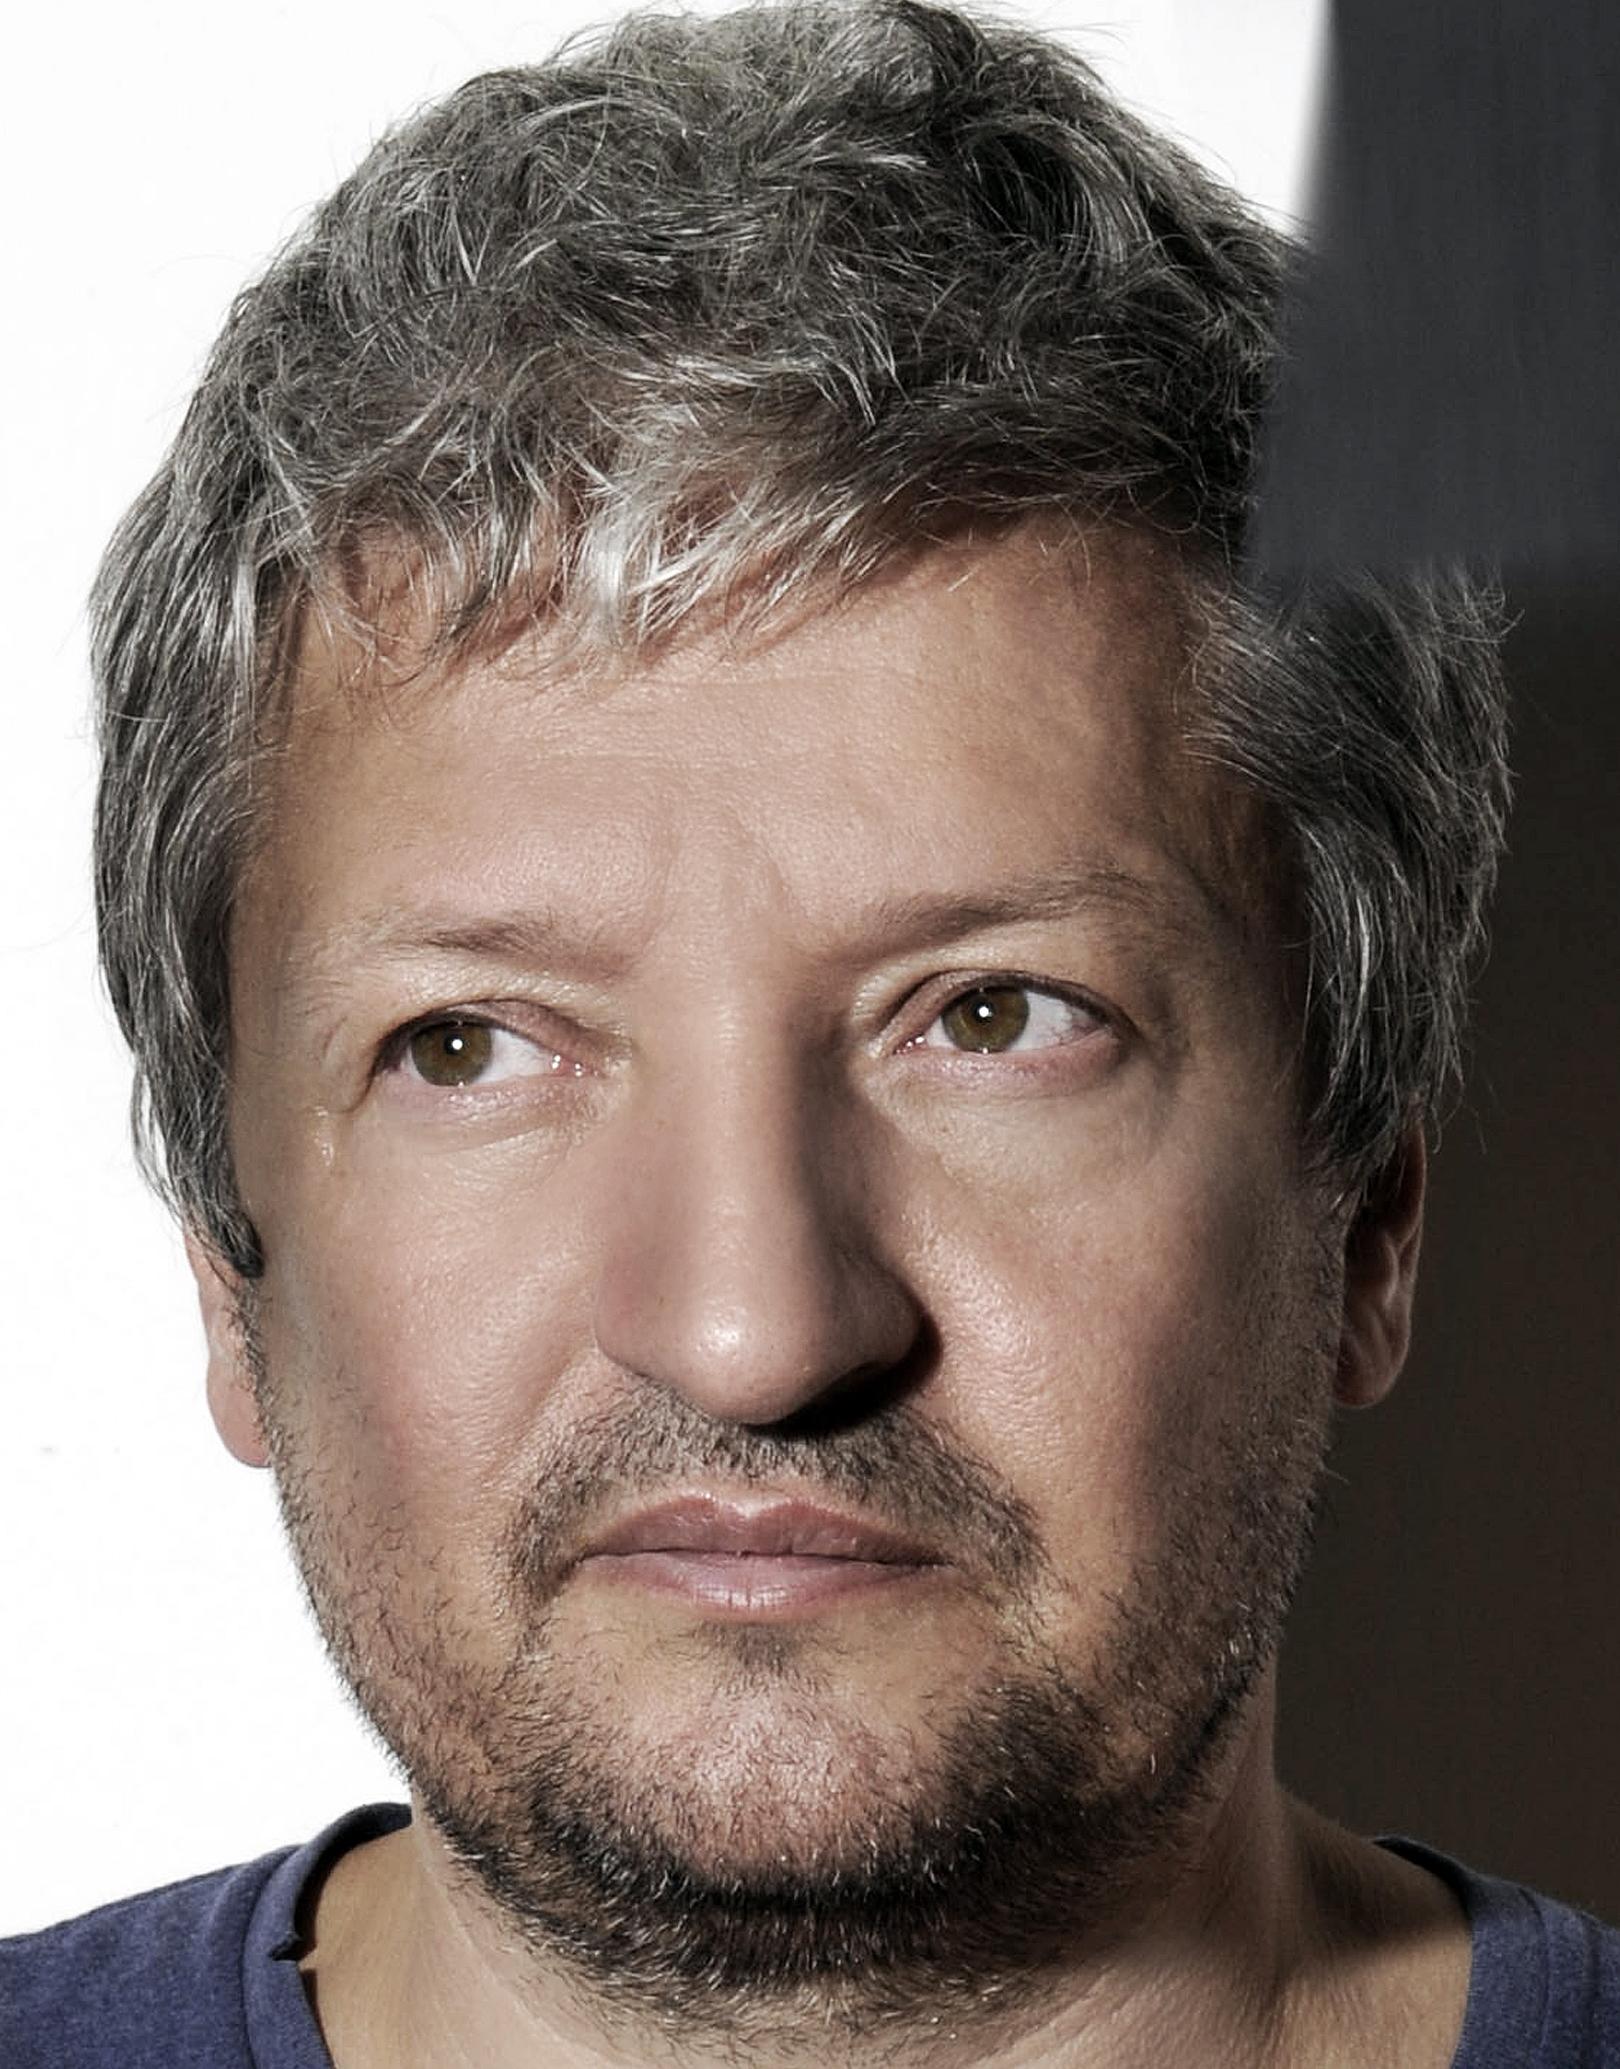 Miloš Lochman